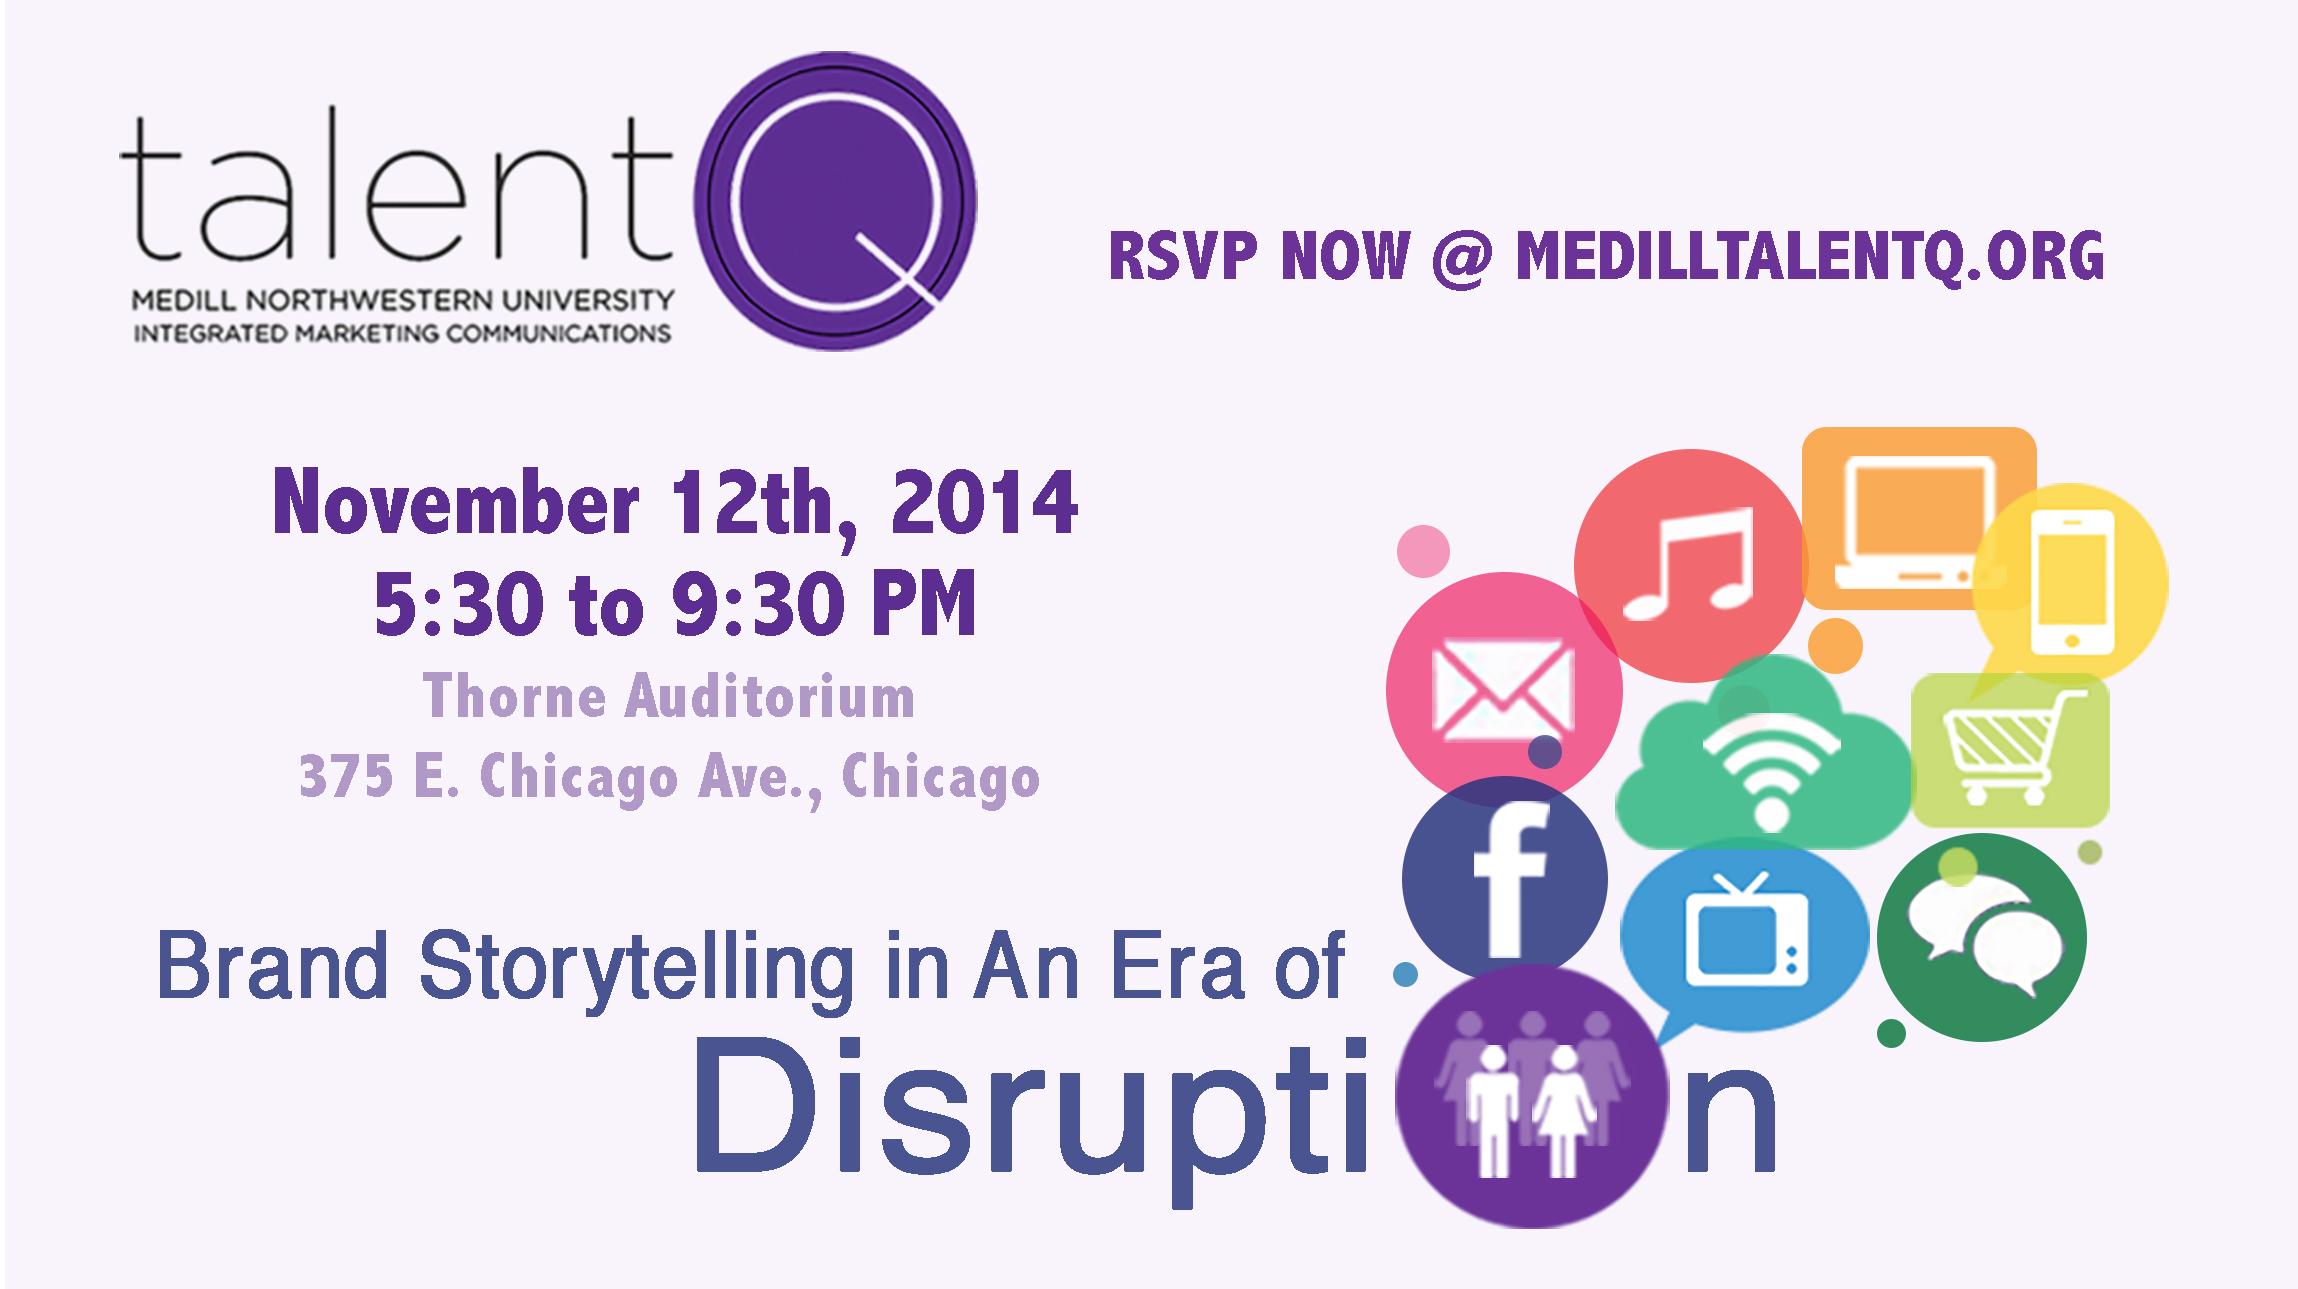 Brand Storytelling in an Era of Disruption